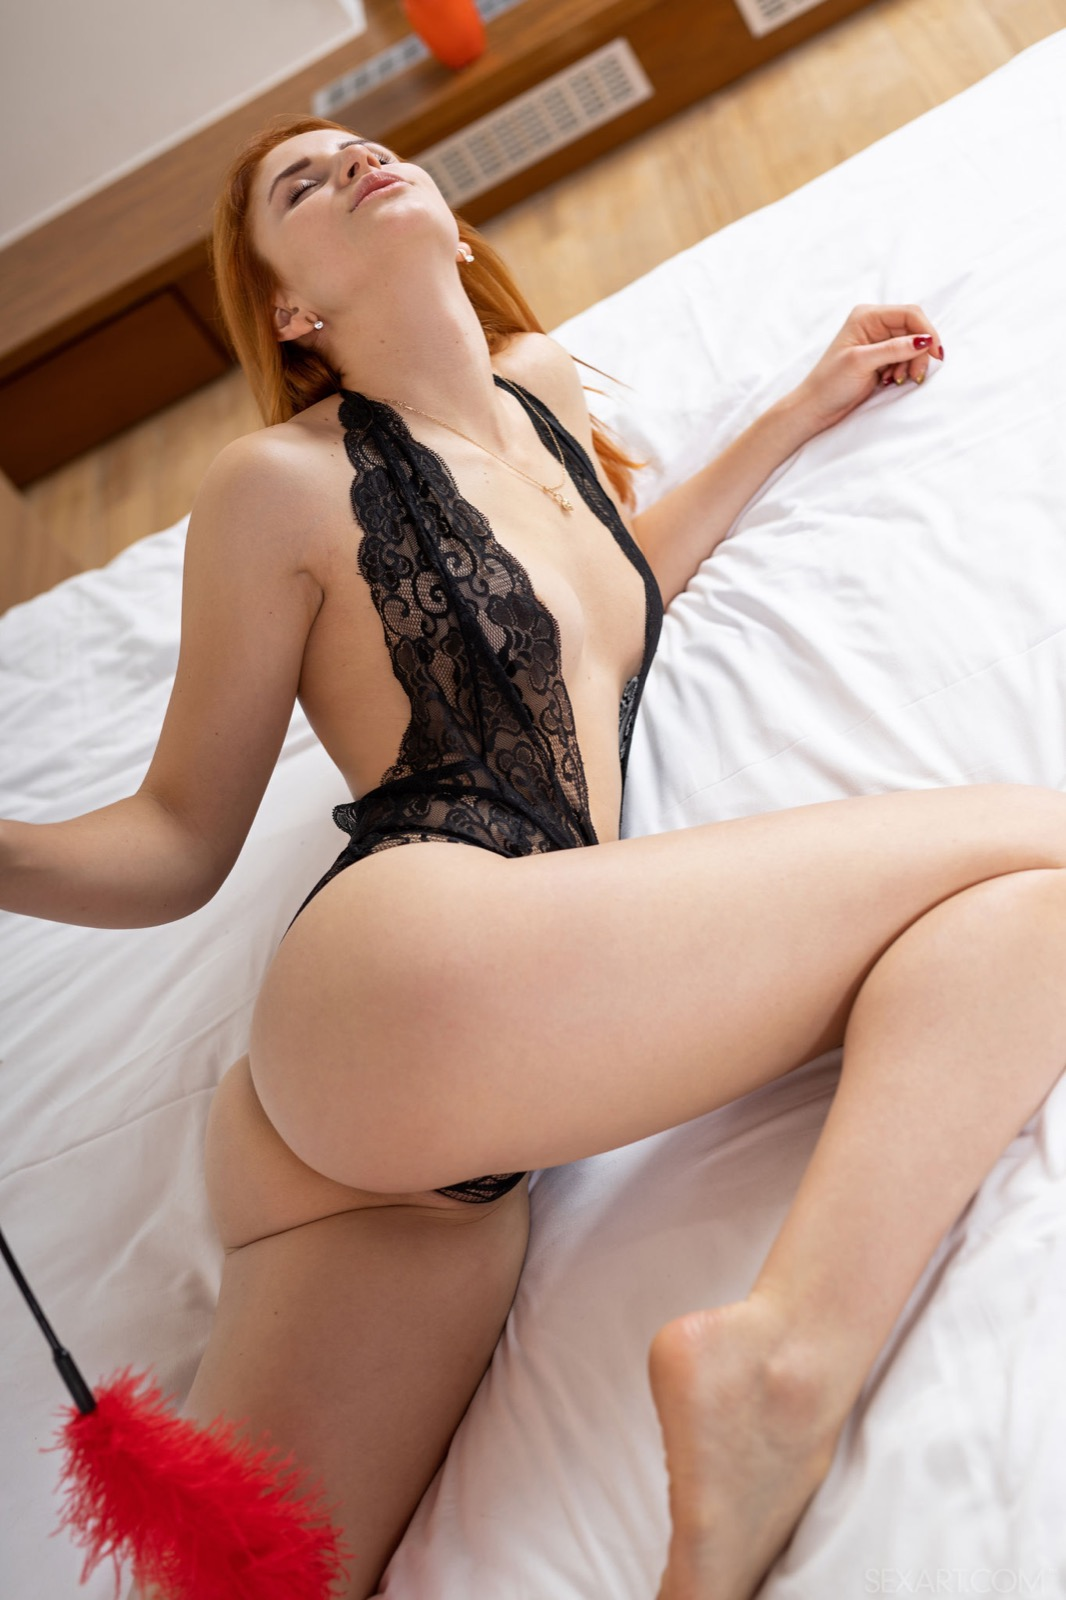 顽皮的女孩 - Sexy Girl - siiri - naked 10355